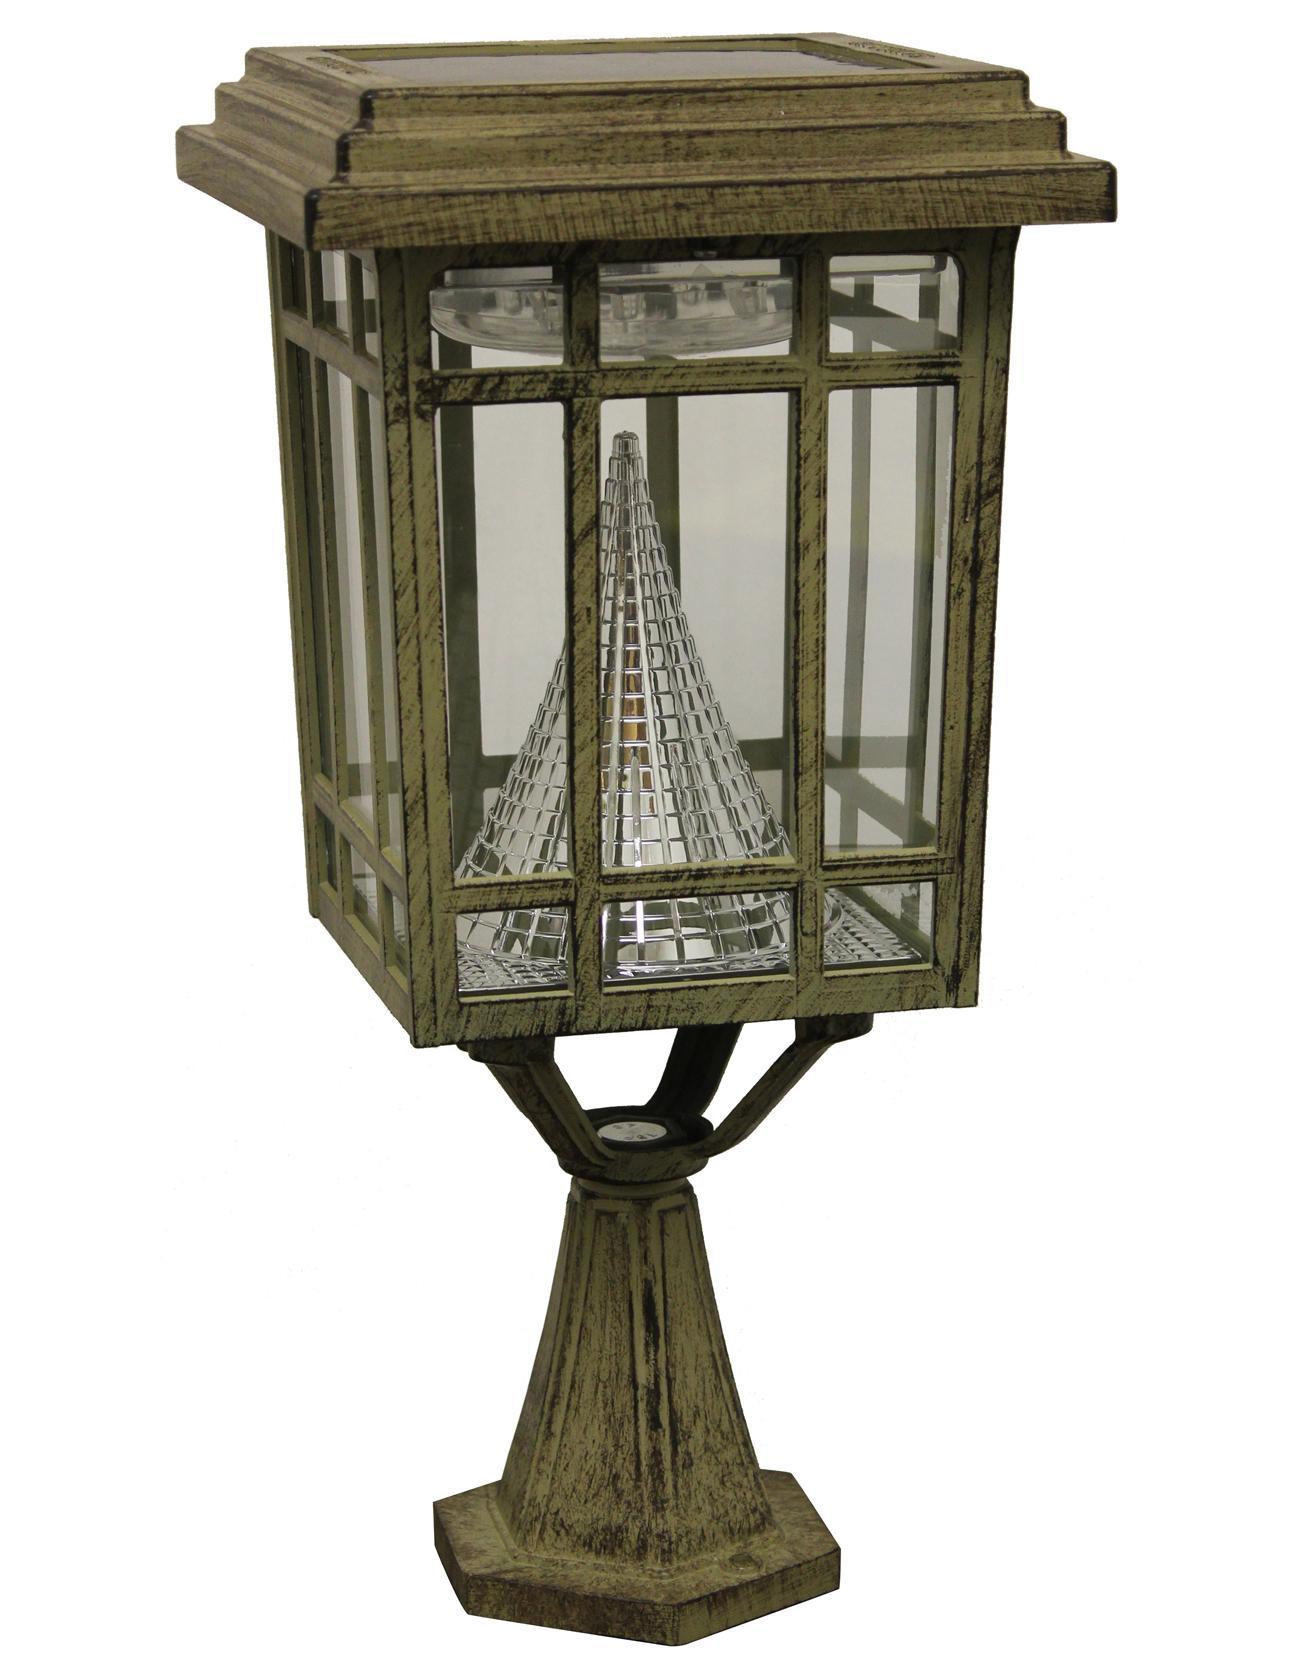 Amazon.com : Gama Sonic Prairie Solar LED Light Fixture, Pole/Post